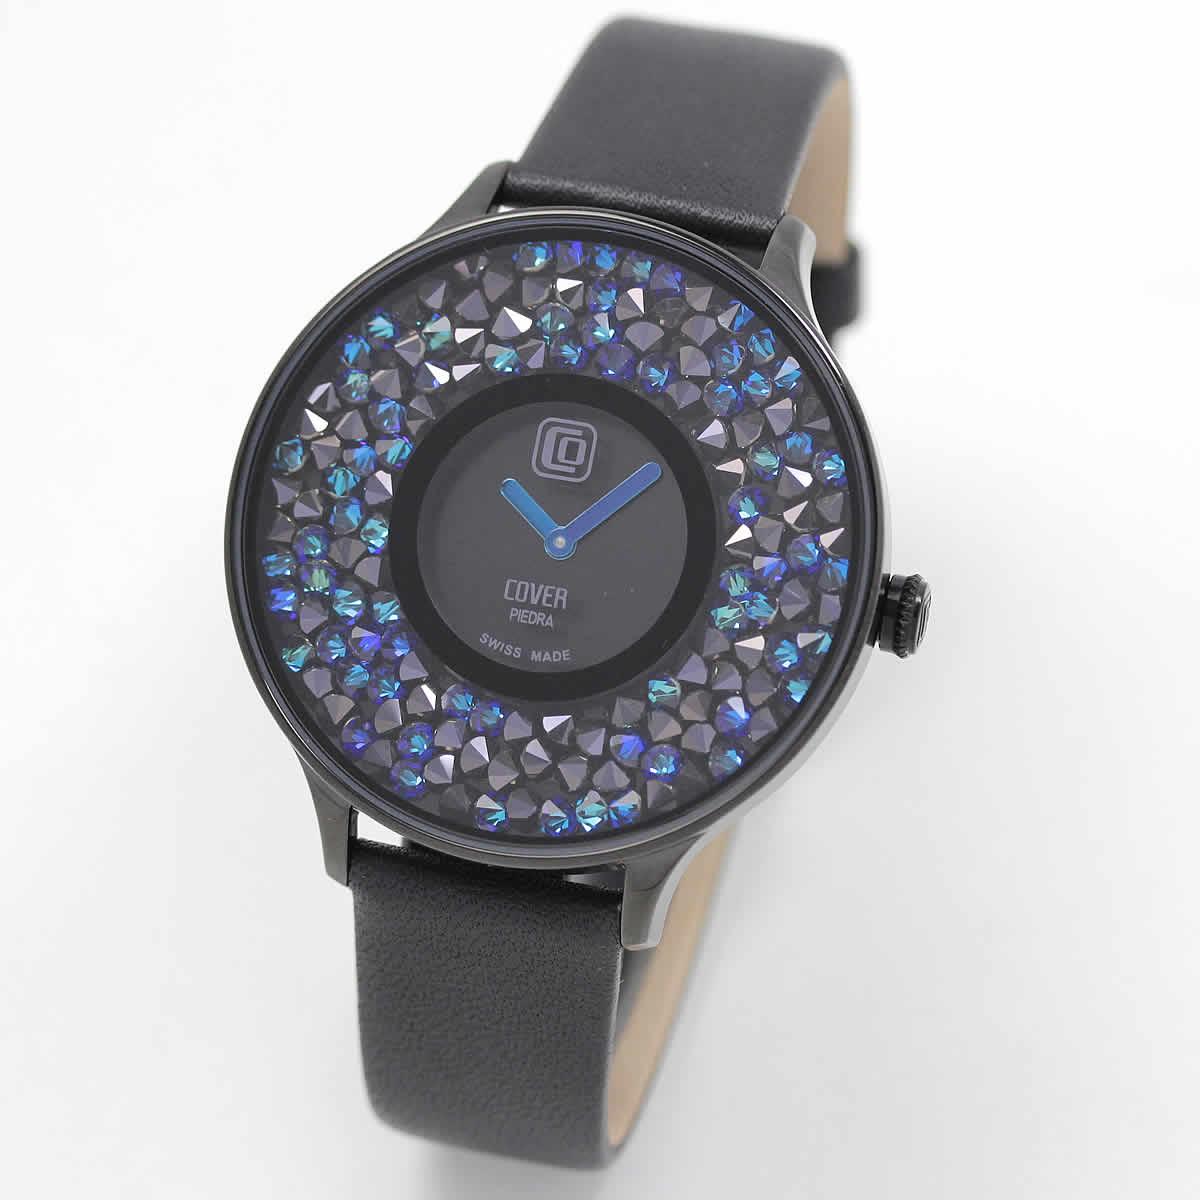 COVER(コヴァー) TREND PIEDRA Co158.04 ブラック 女性用腕時計